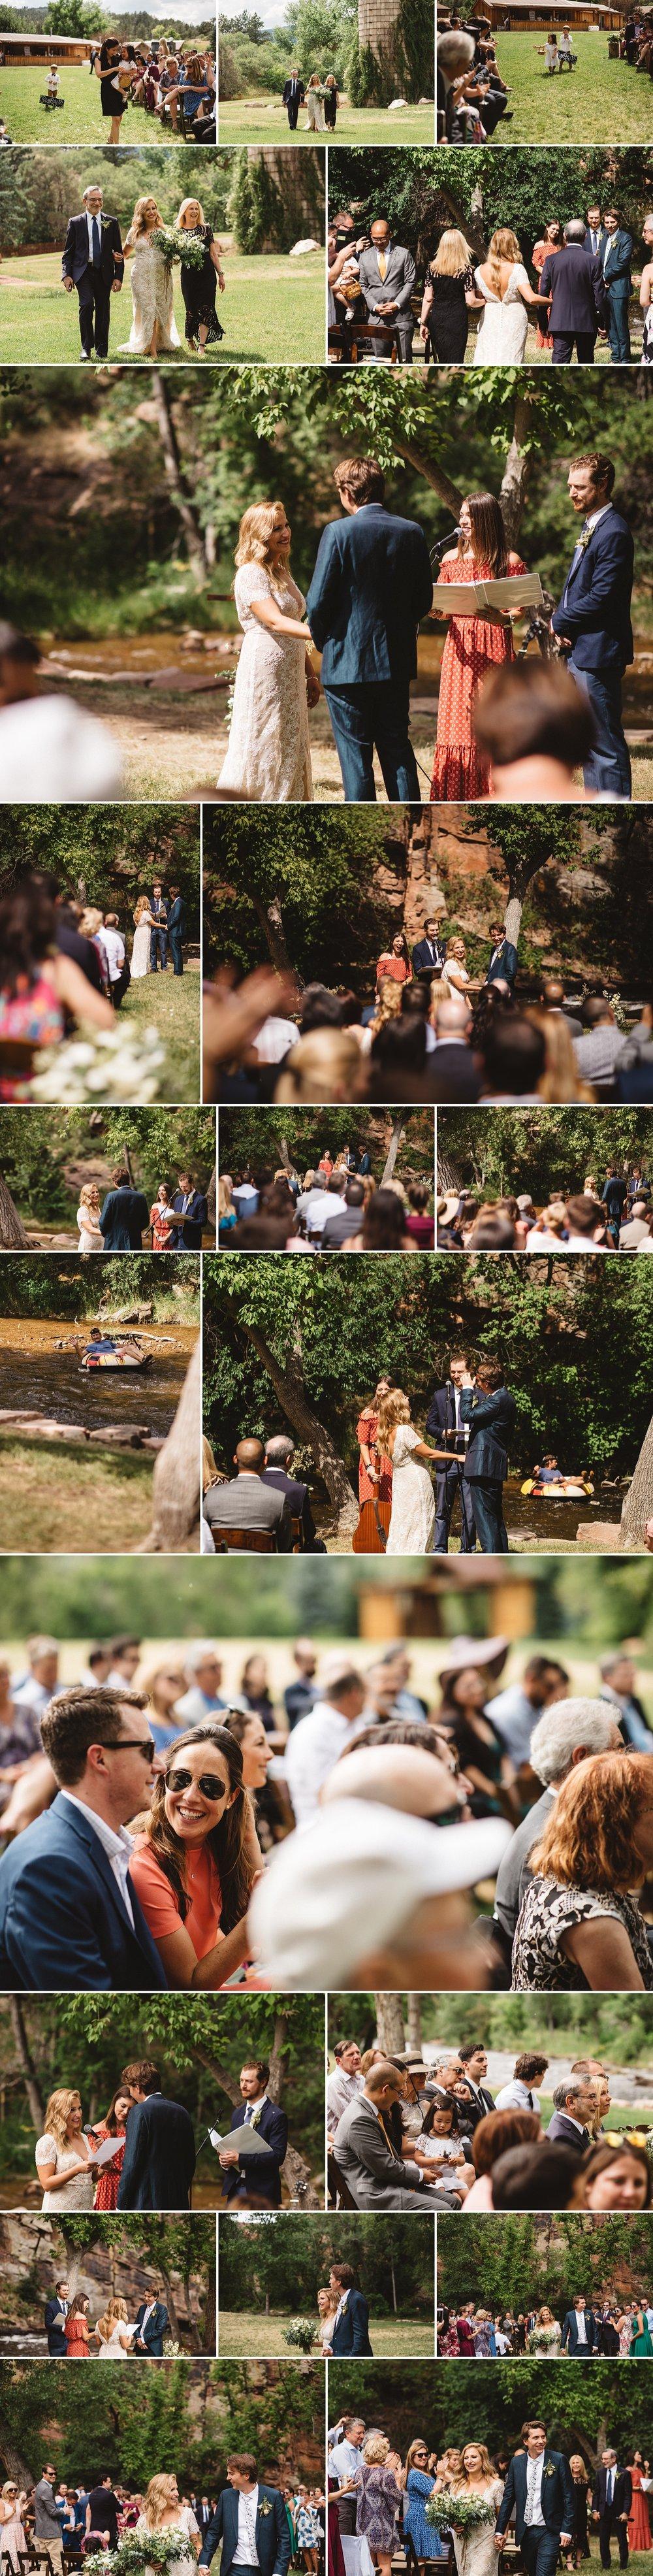 Planet-Bluegrass-Wedding-Lyons-Colorado-Wedding-Ceremony